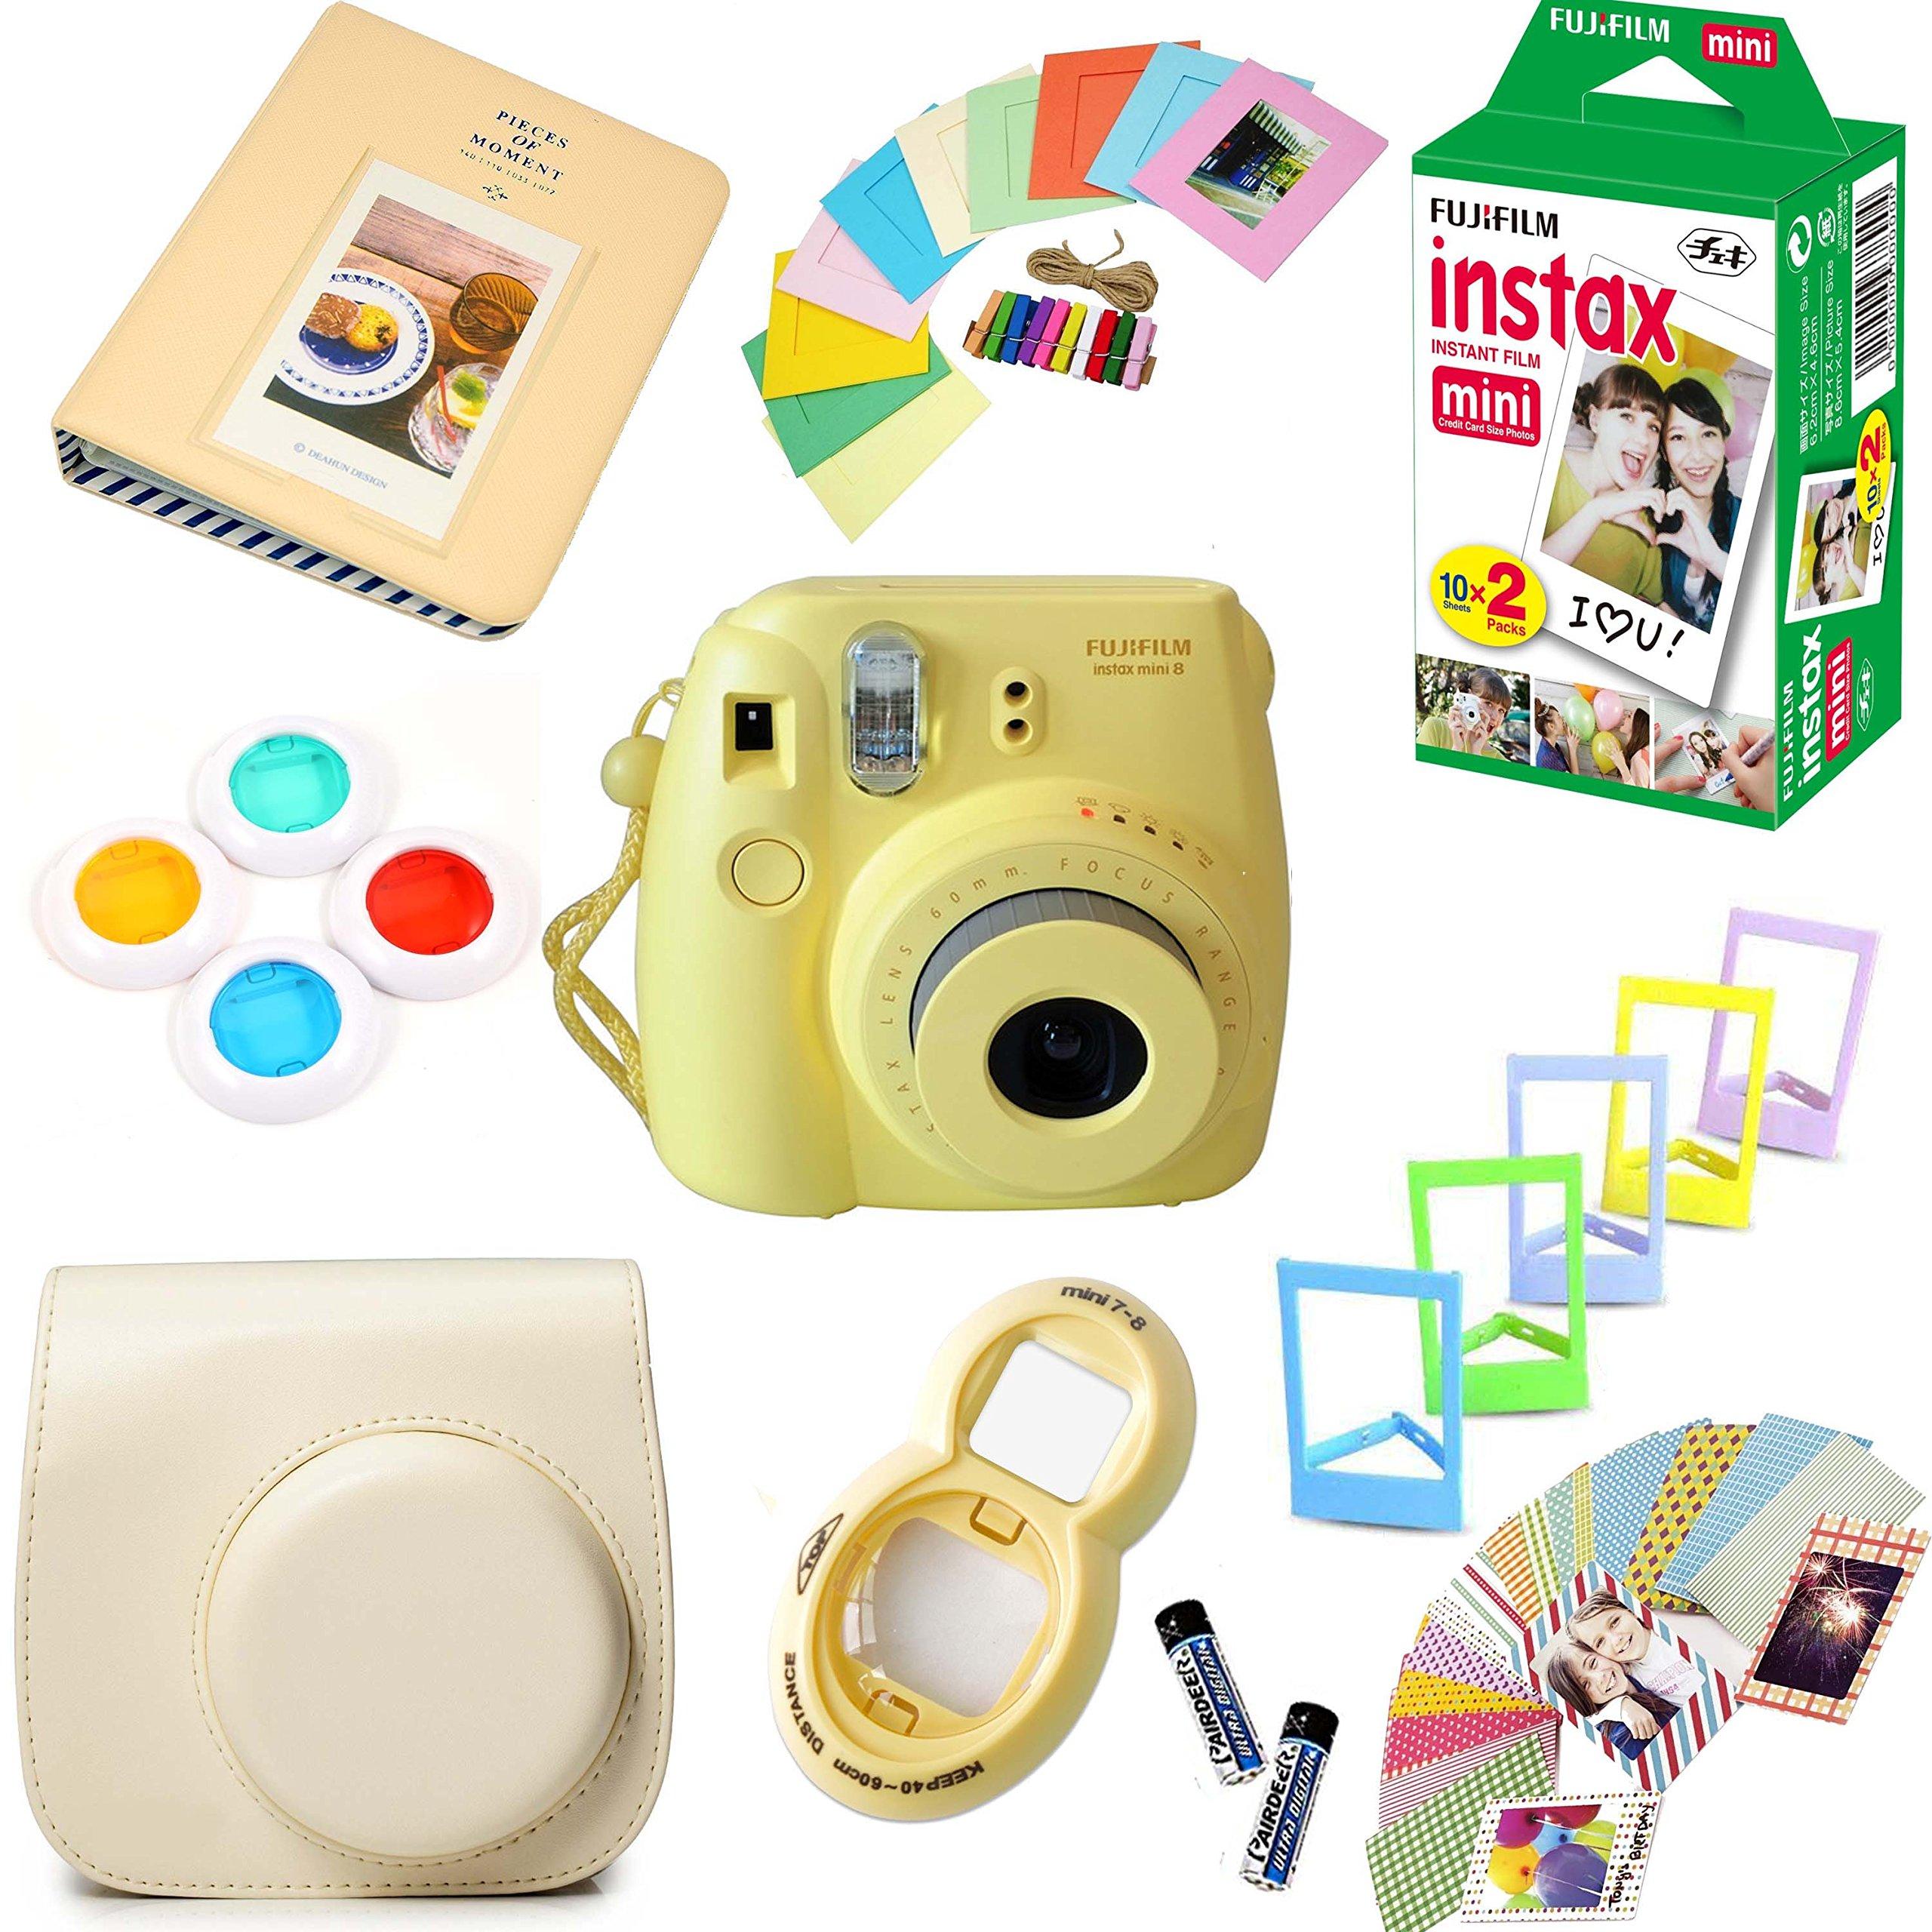 Fujifilm Instax Mini 8 Film Camera (Yellow) + Instax Mini Film (20 Shots) + Protective Camera Case + Selfie Lens + Filters + Frames Photix Decorative Design Kit by Fujifilm